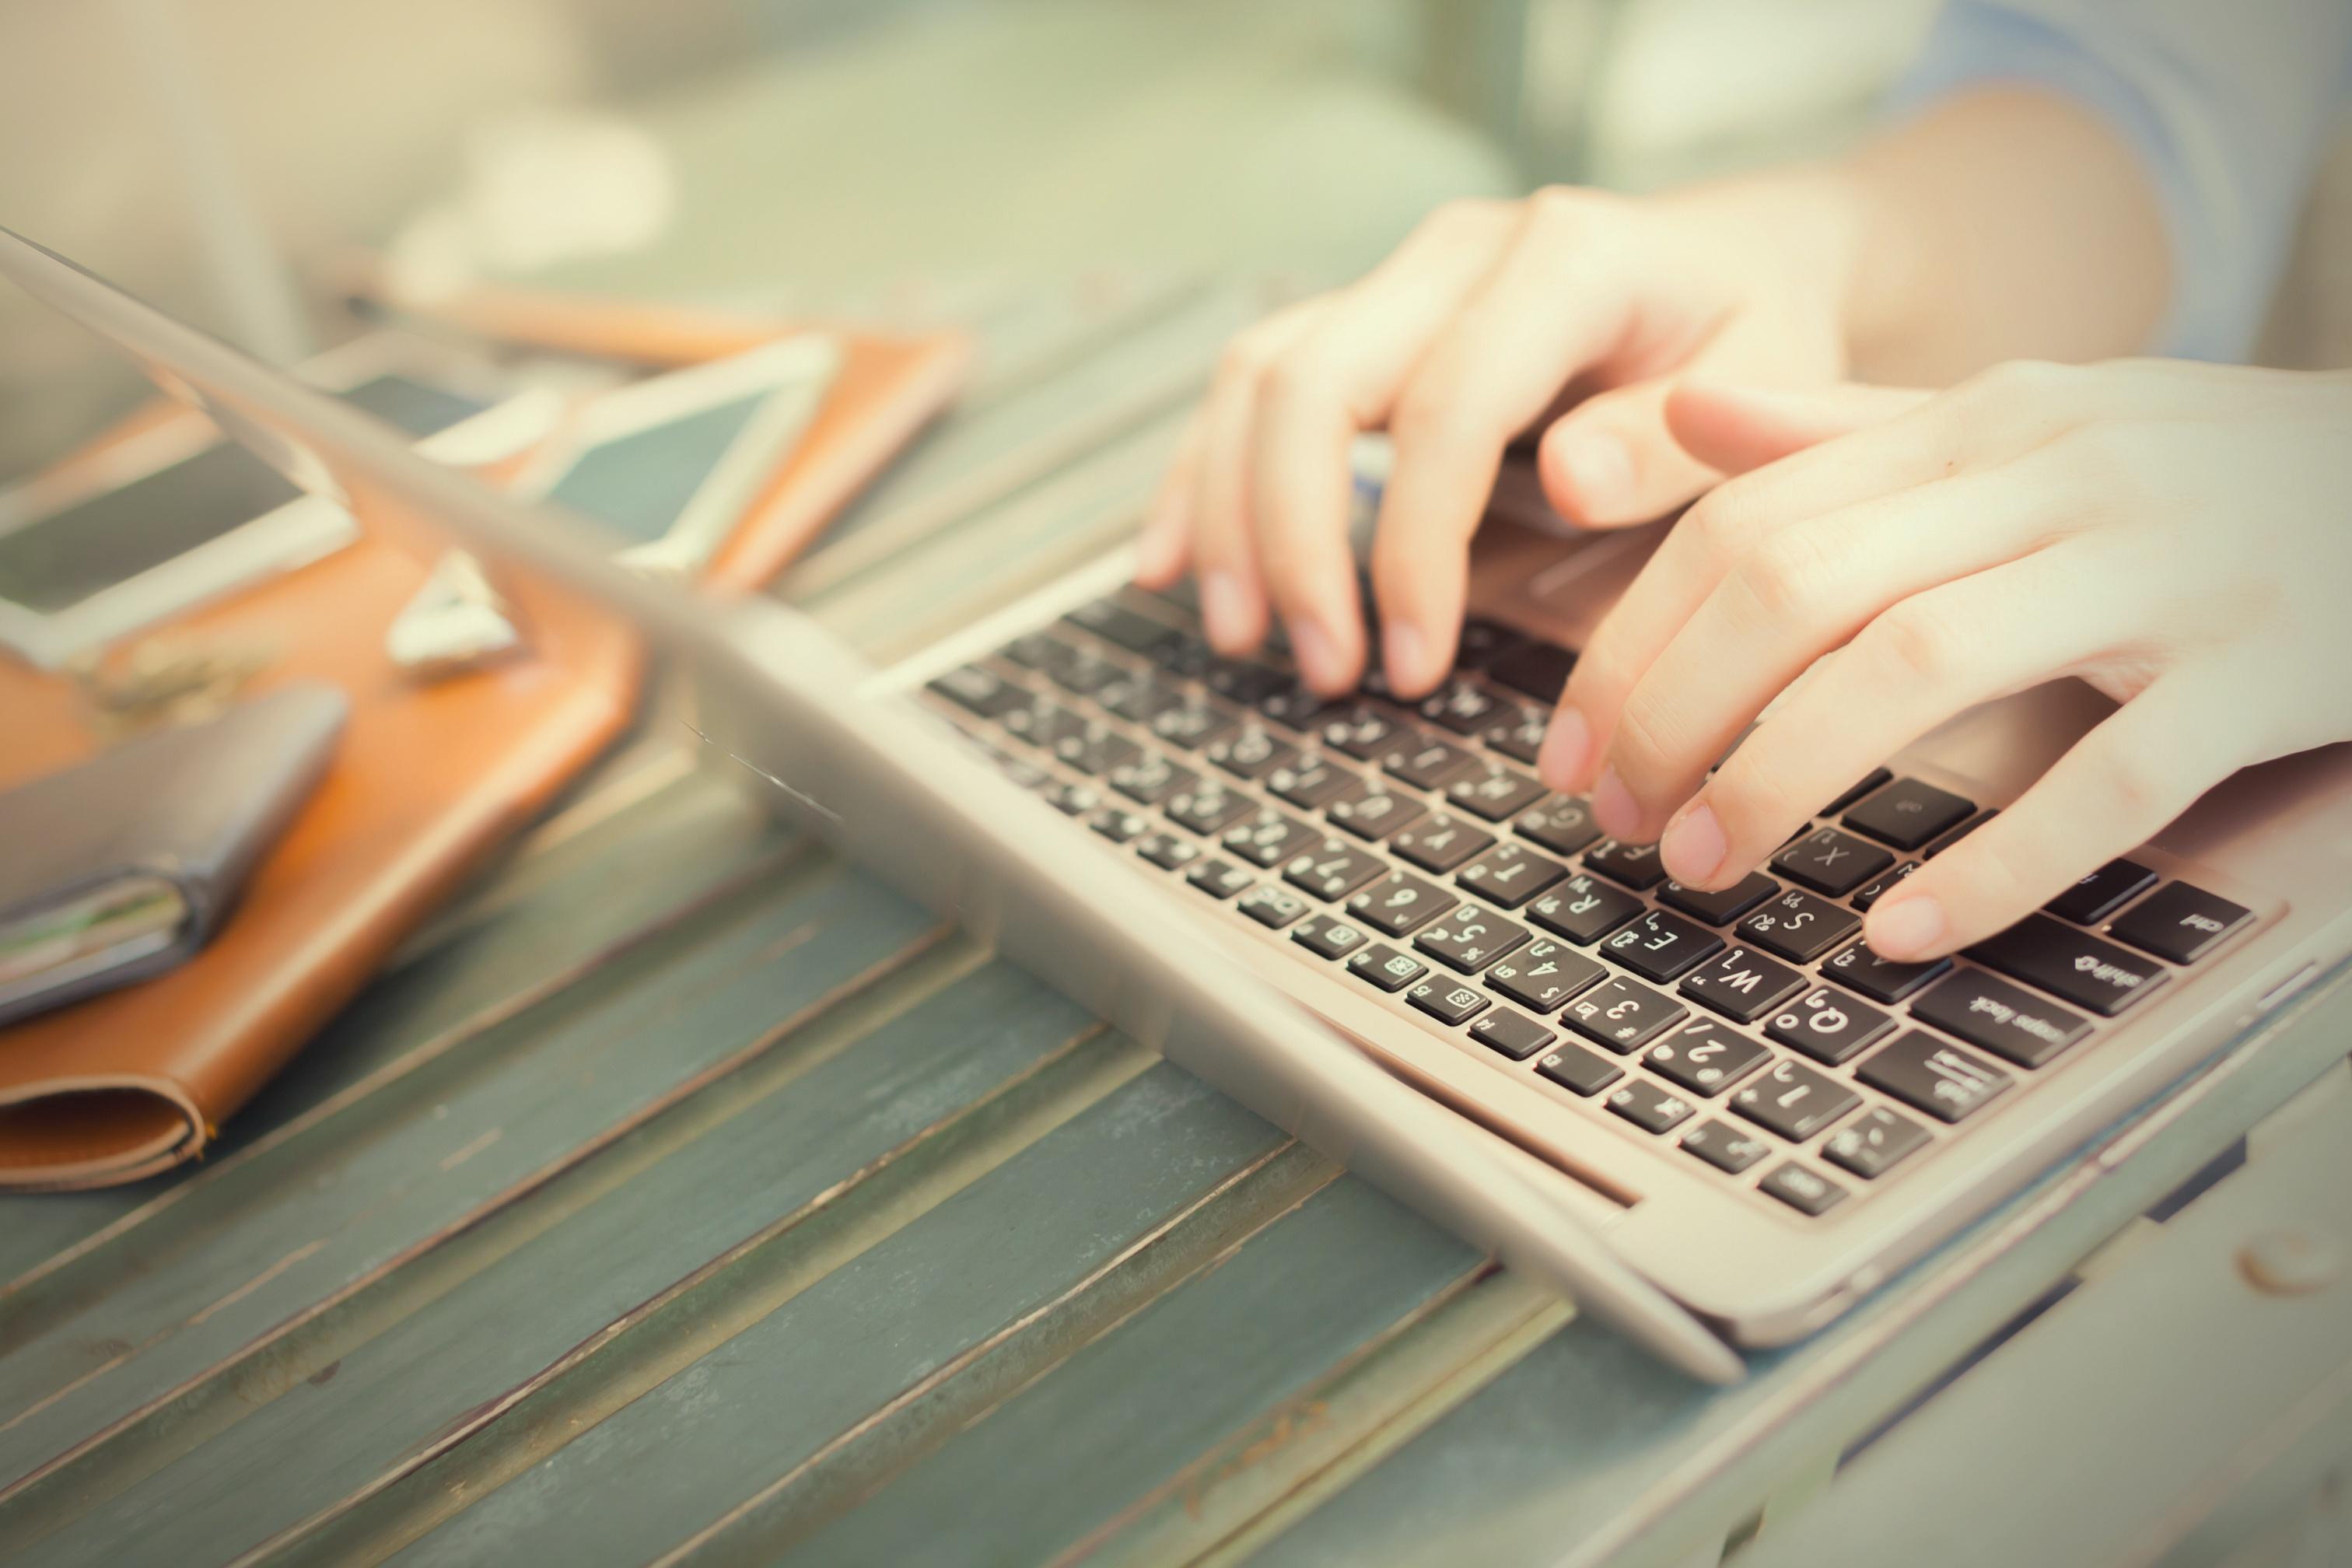 8 Writing Tips I Wish I Knew Before I Started Blogging